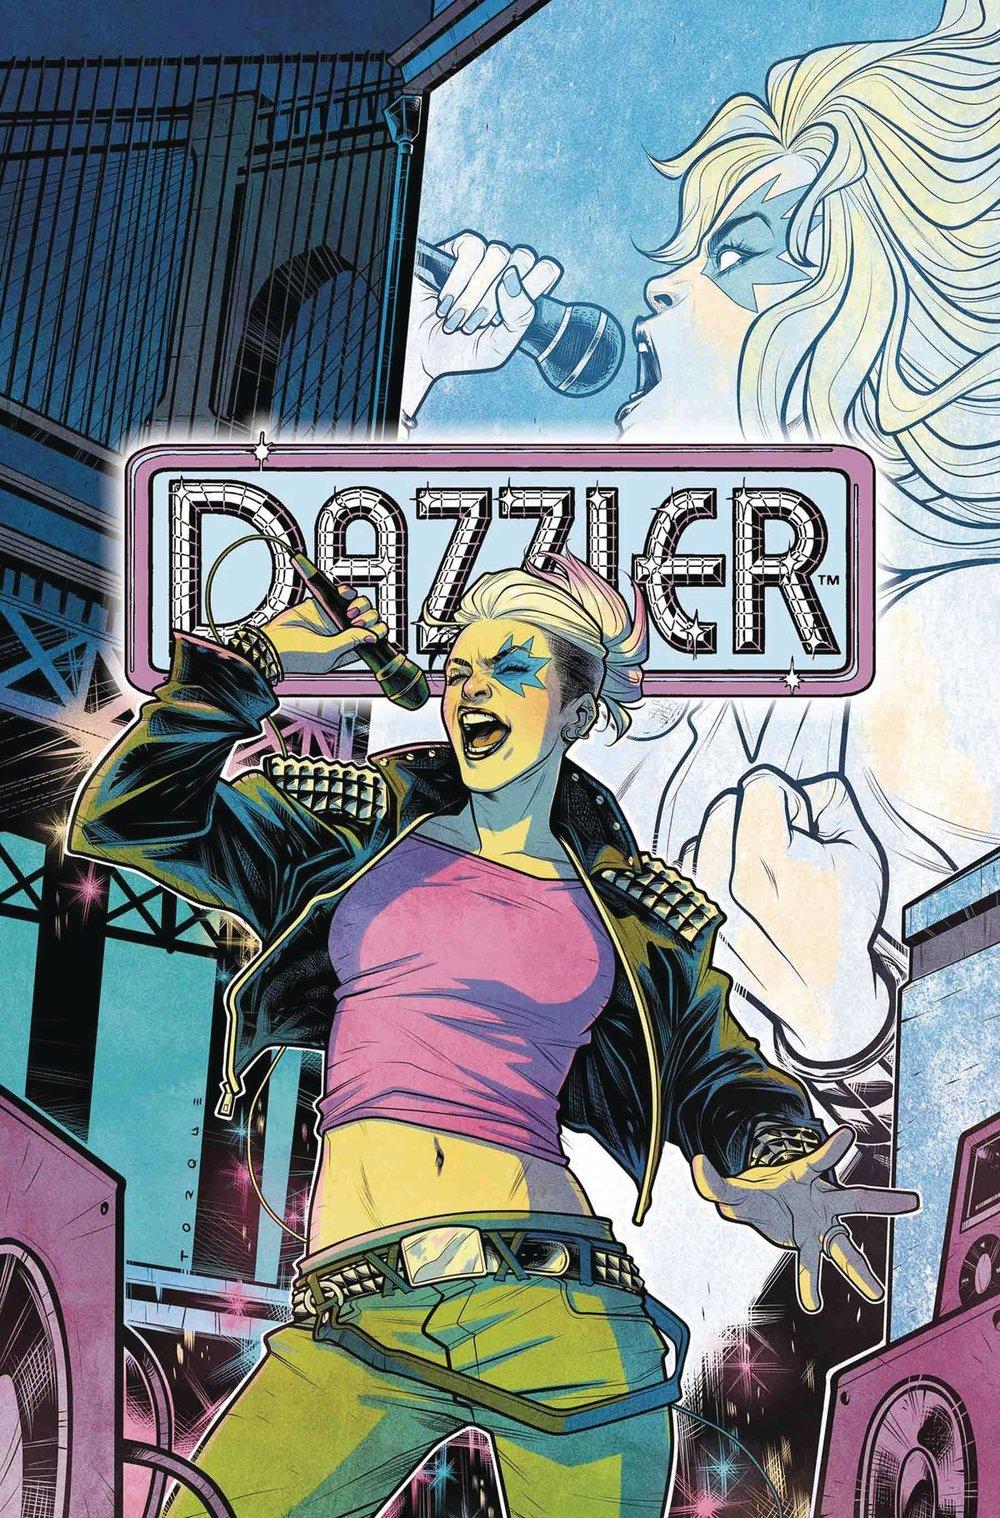 DAZZLER X SONG #1